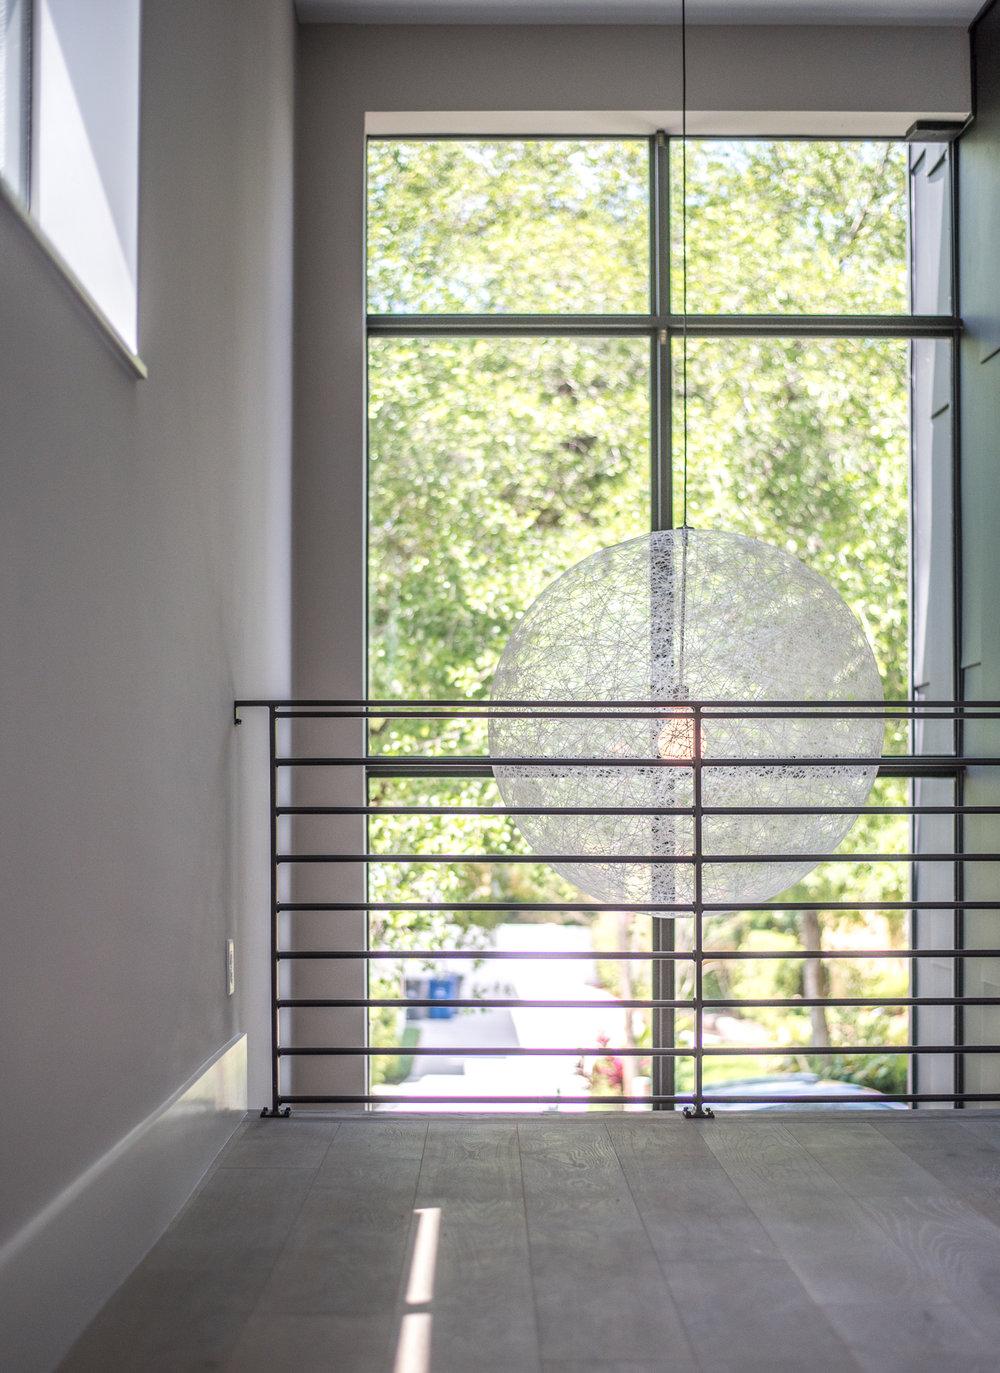 michael-wenrich-architect-arlington-10.jpg